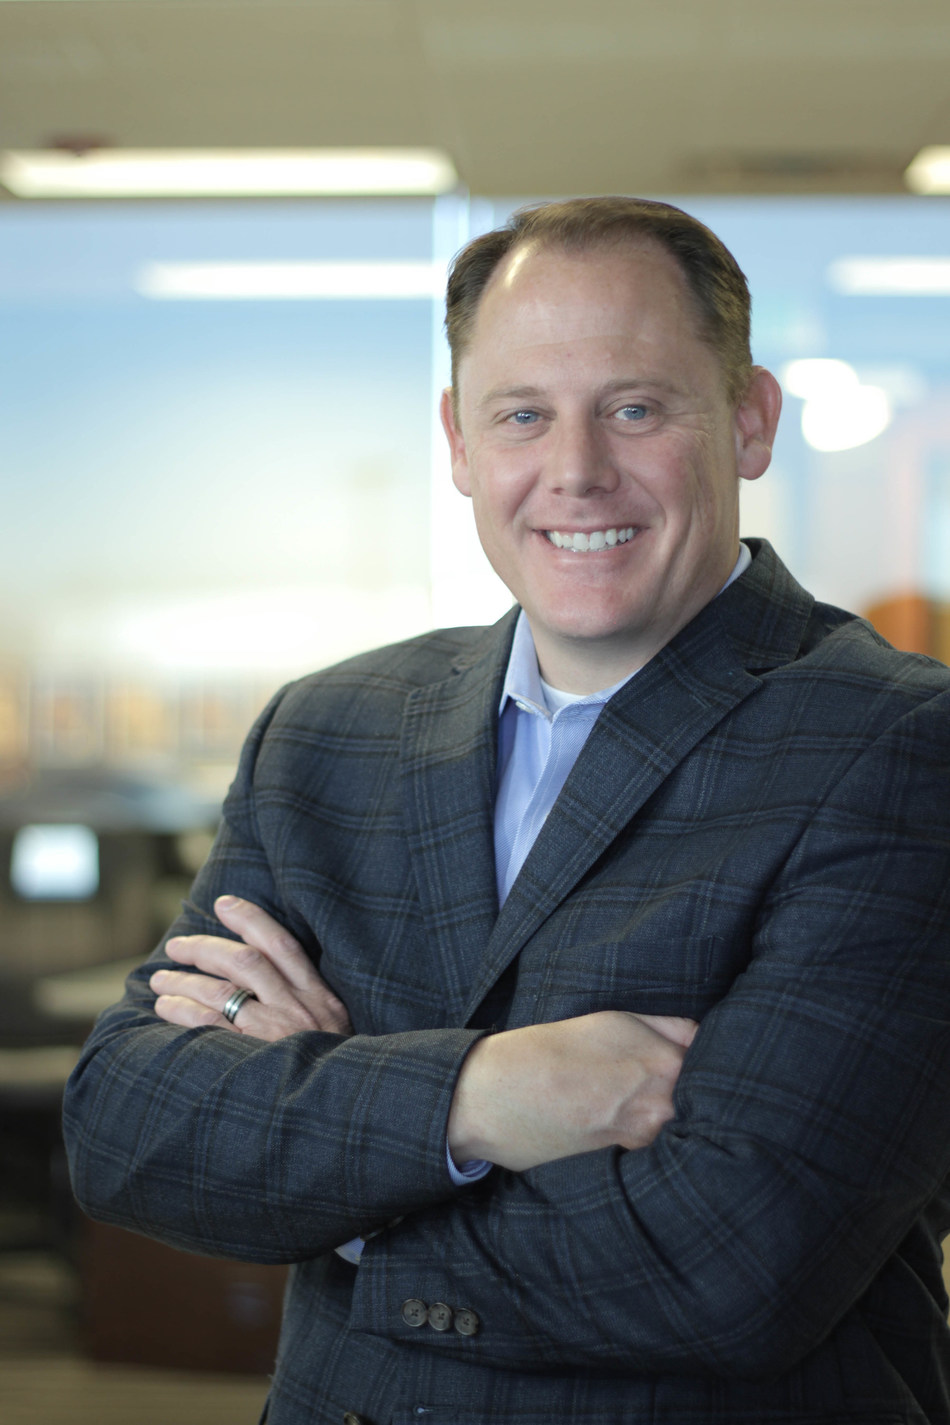 Jason Beardall, President, England Logistics